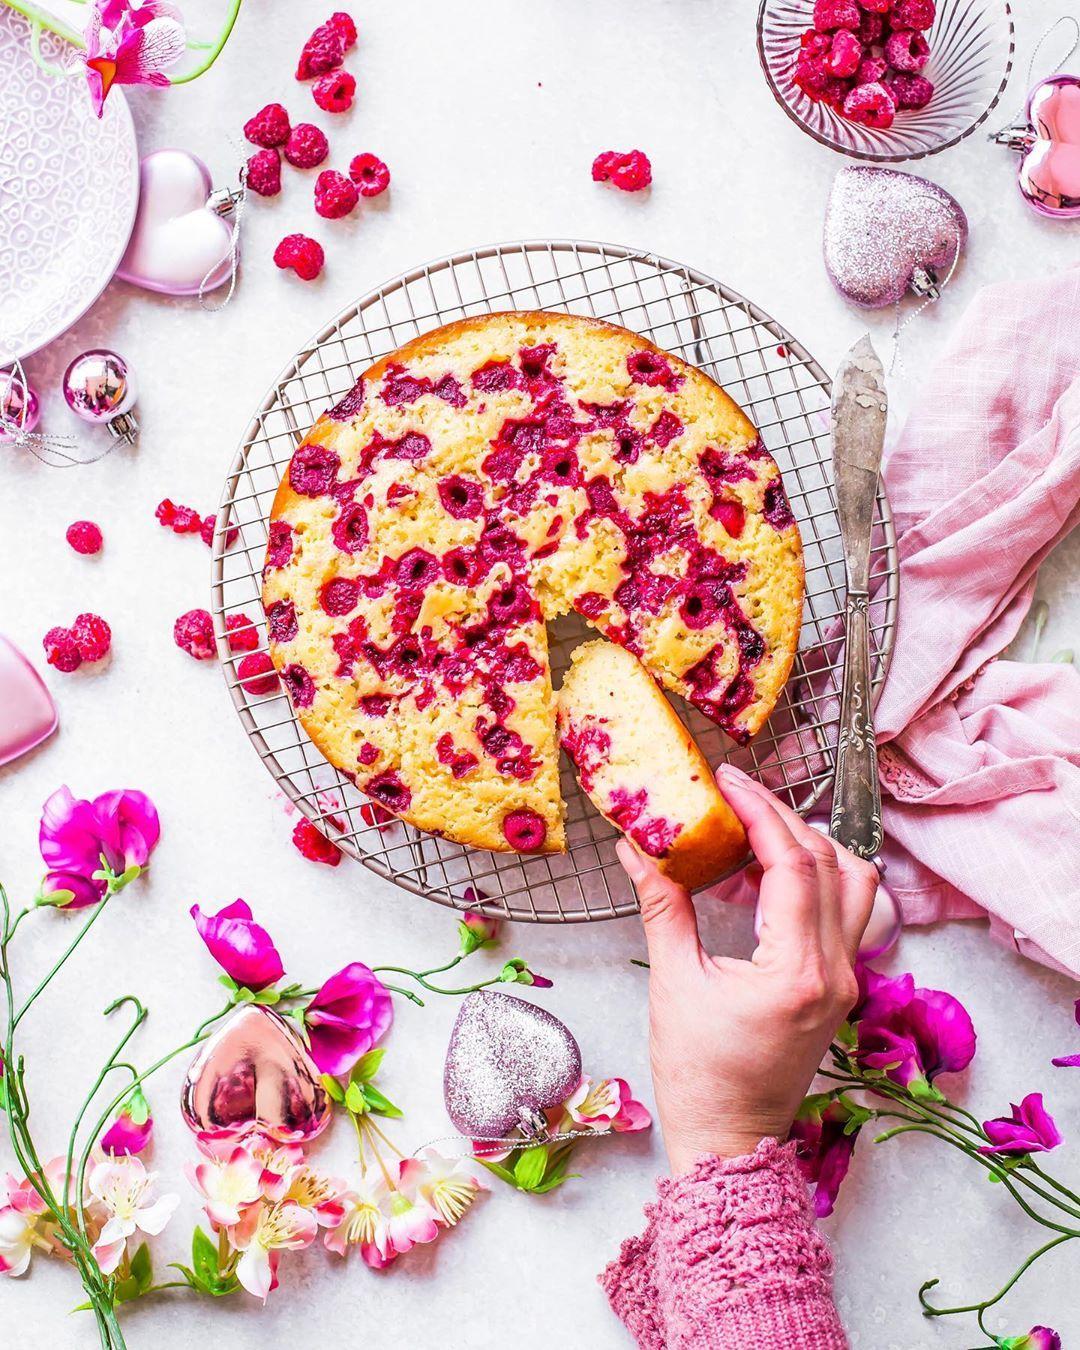 #cake #art #fondantart #specialtycakes #cakedecorator #cakevideo #caketutorial #instacake #cakeart #cakeoftheday #cakeartist #kek #birthdaycake #pastry #cakeboss #kekc